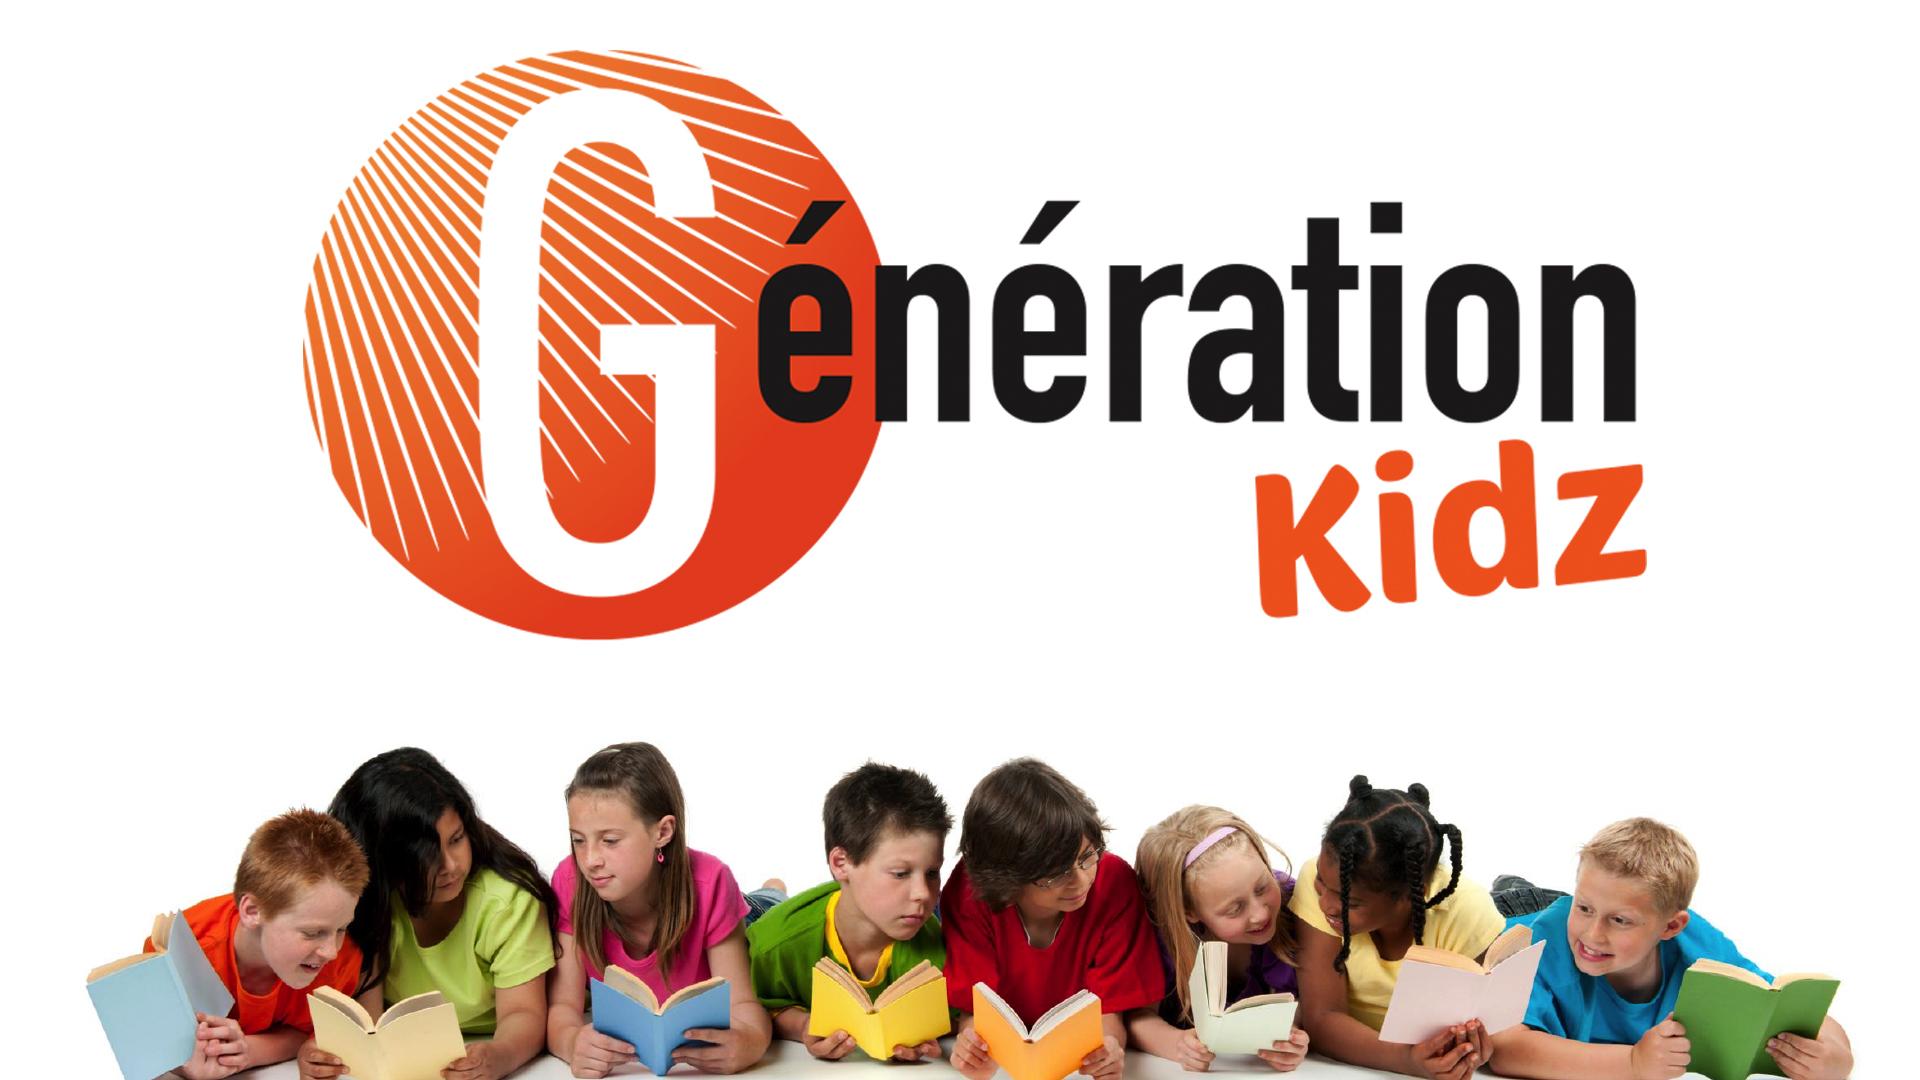 Generation Kidz web